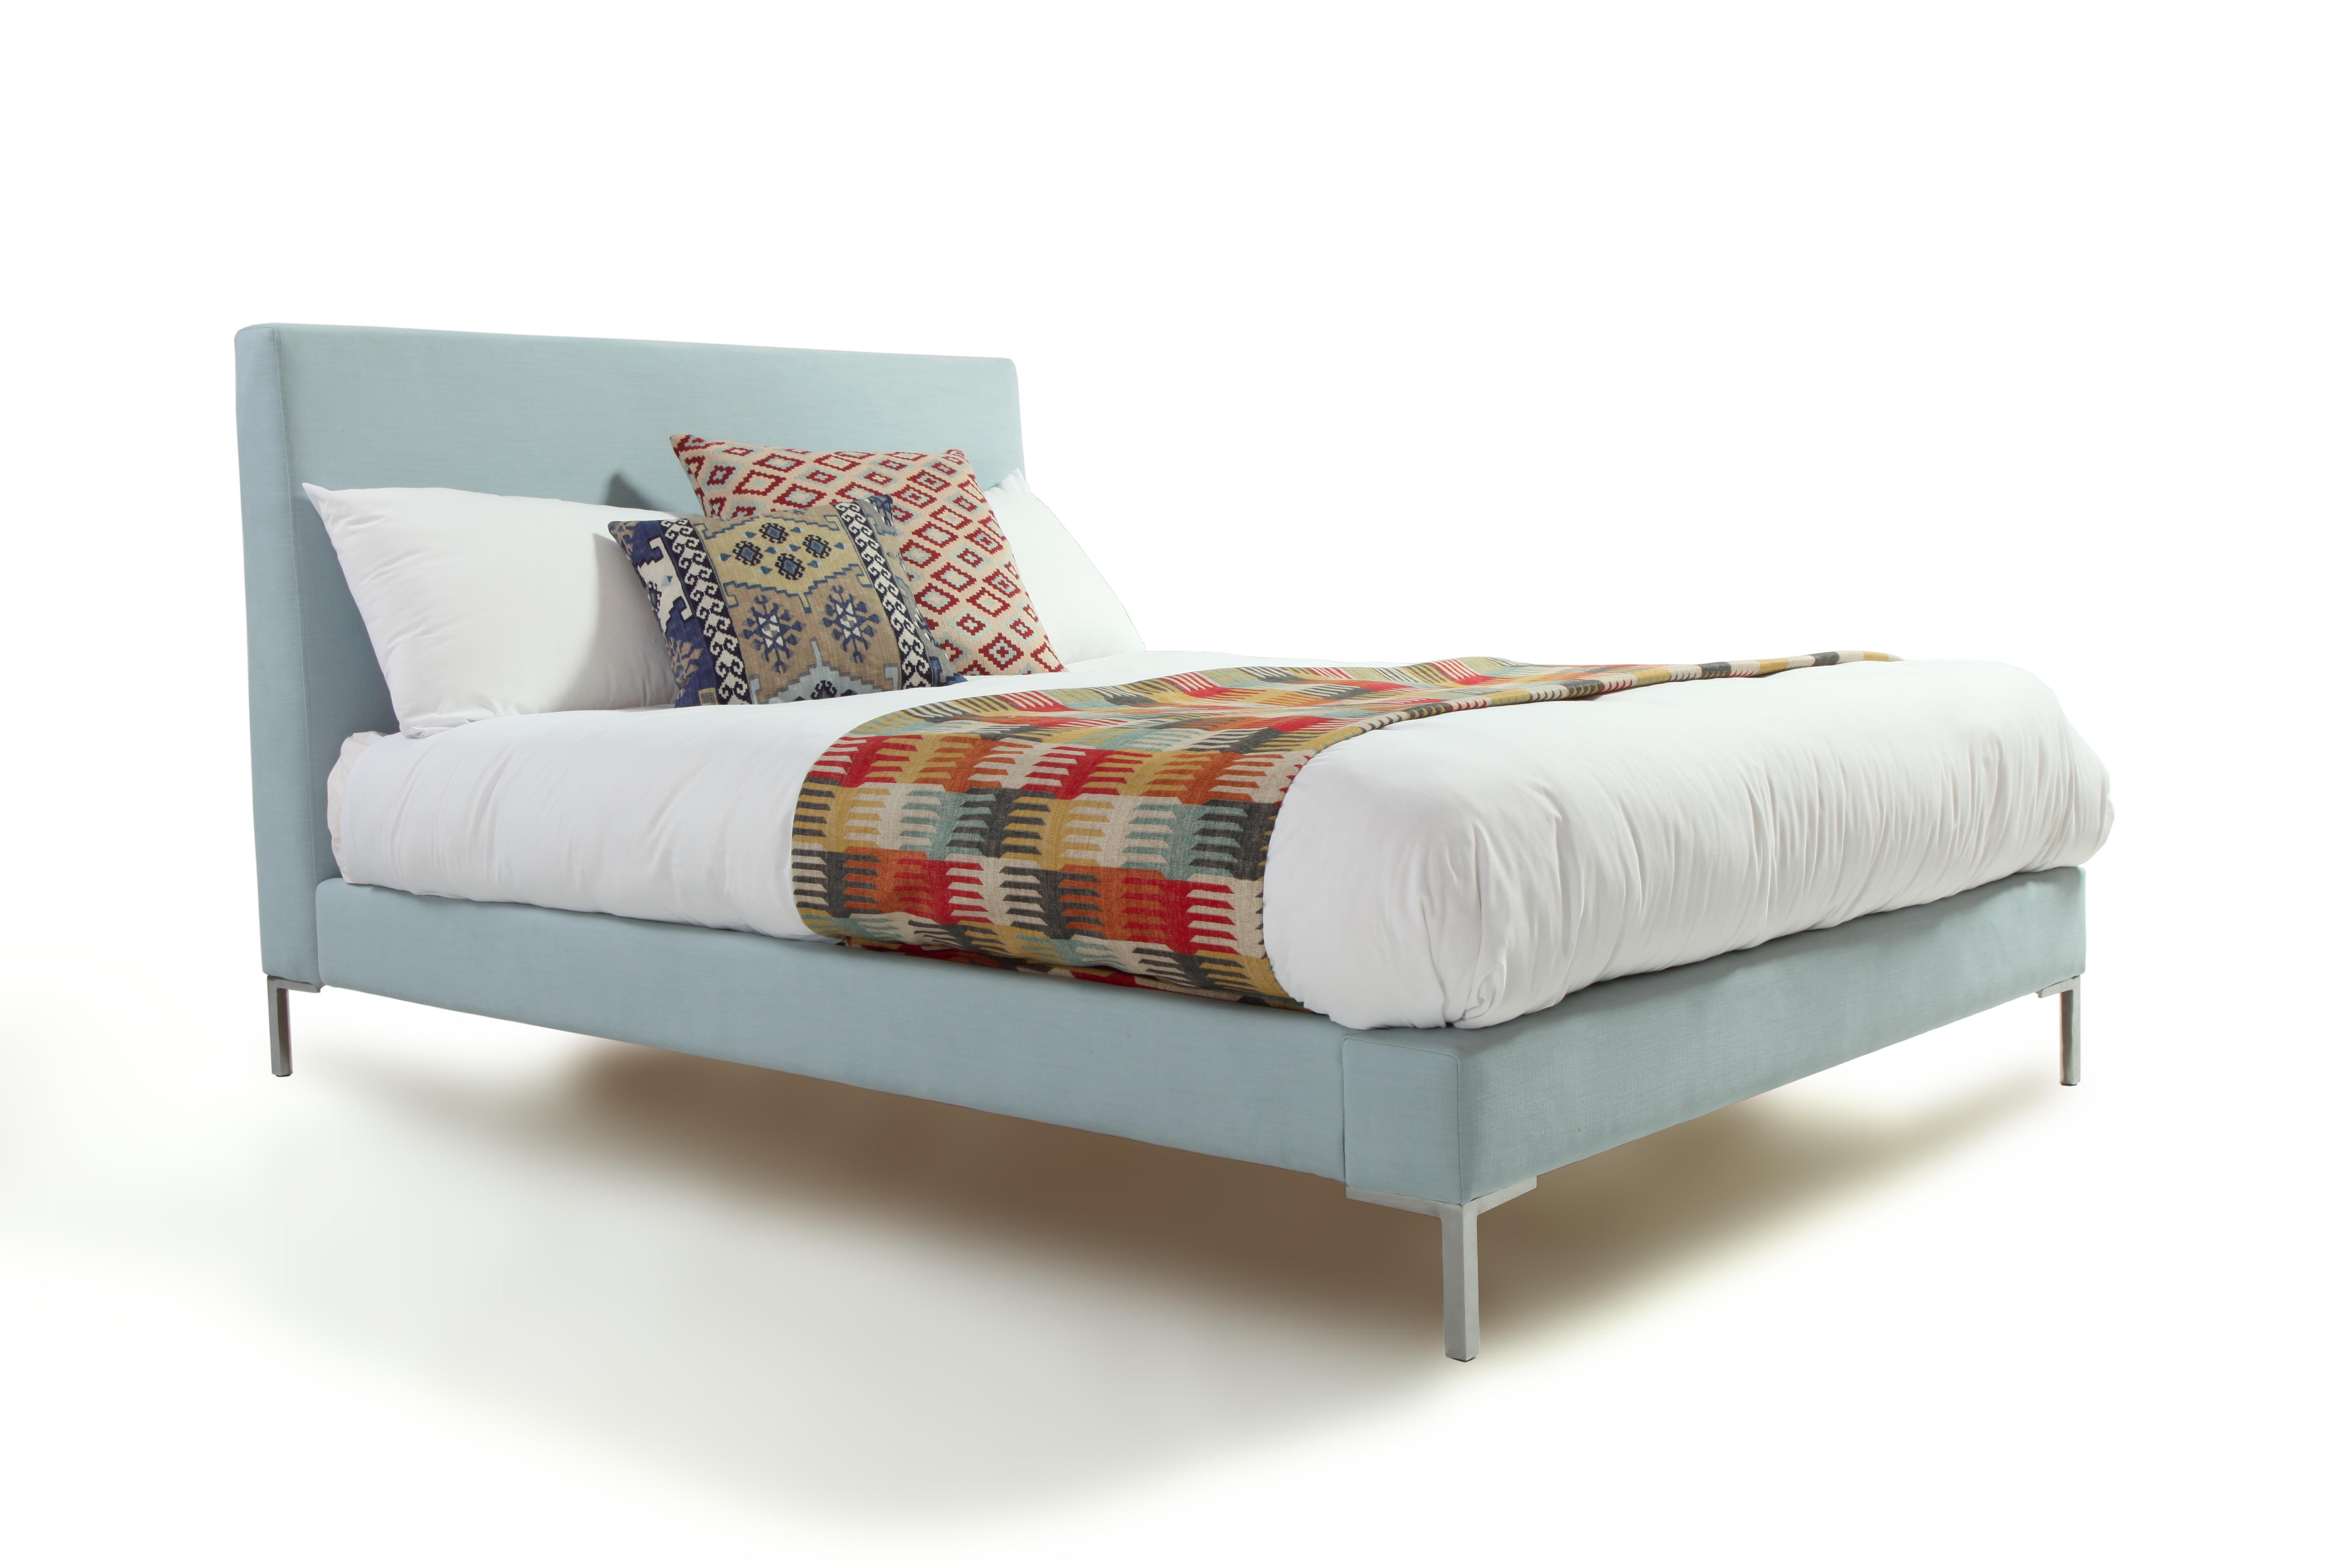 Latitude Bed Gallery